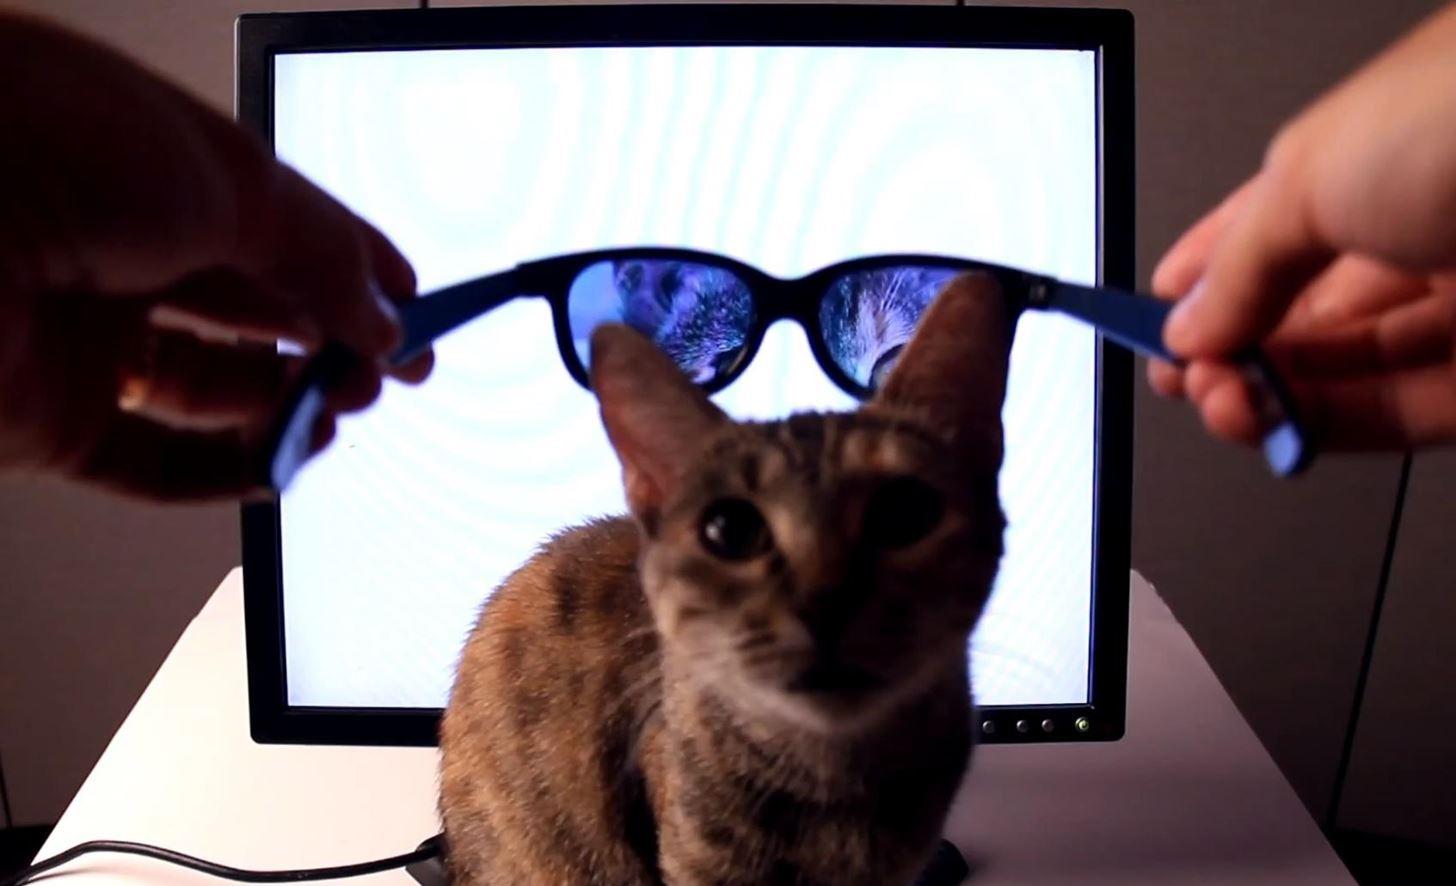 Lcd Monitor Polarized Glasses Louisiana Bucket Brigade Polarizer 17 Inch Screen Slevi1mitedu